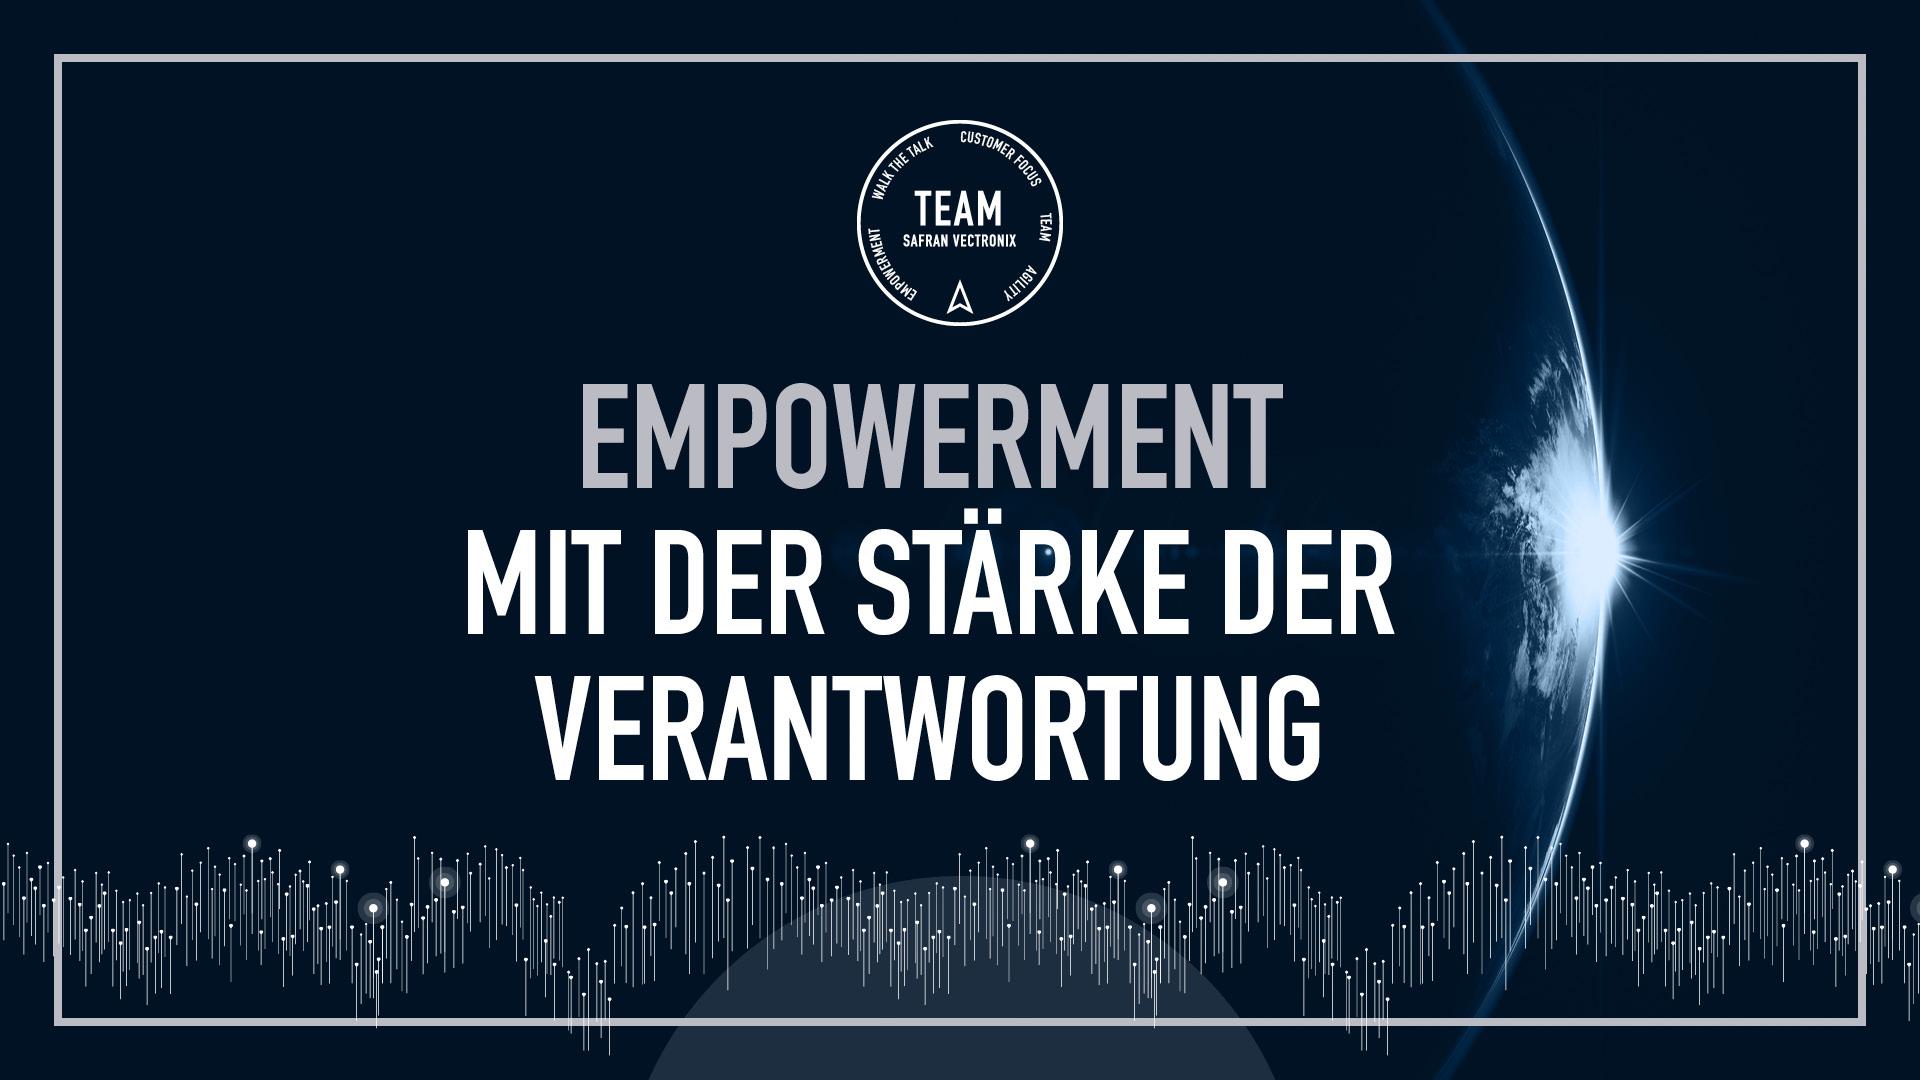 safran vectronix values empowerment